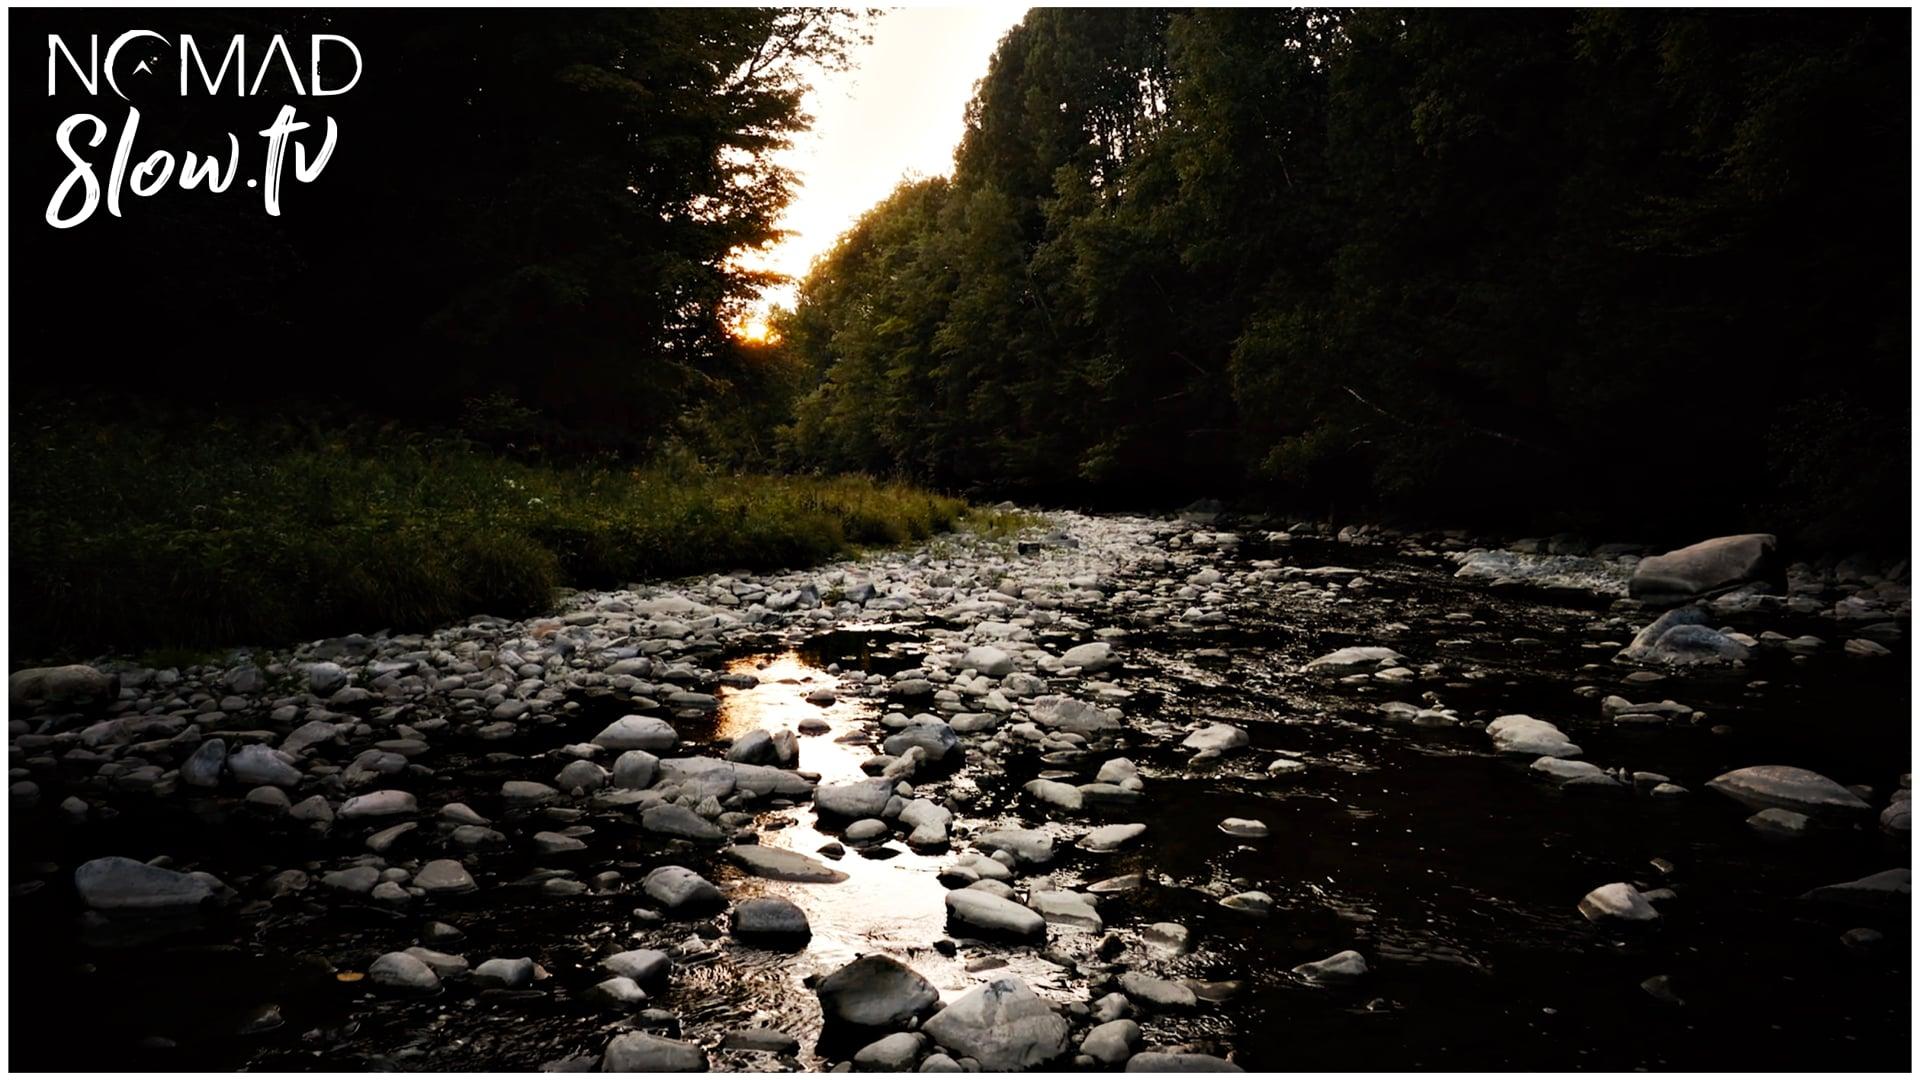 The Dark Glow of the Mountains - Chris Zabriskie